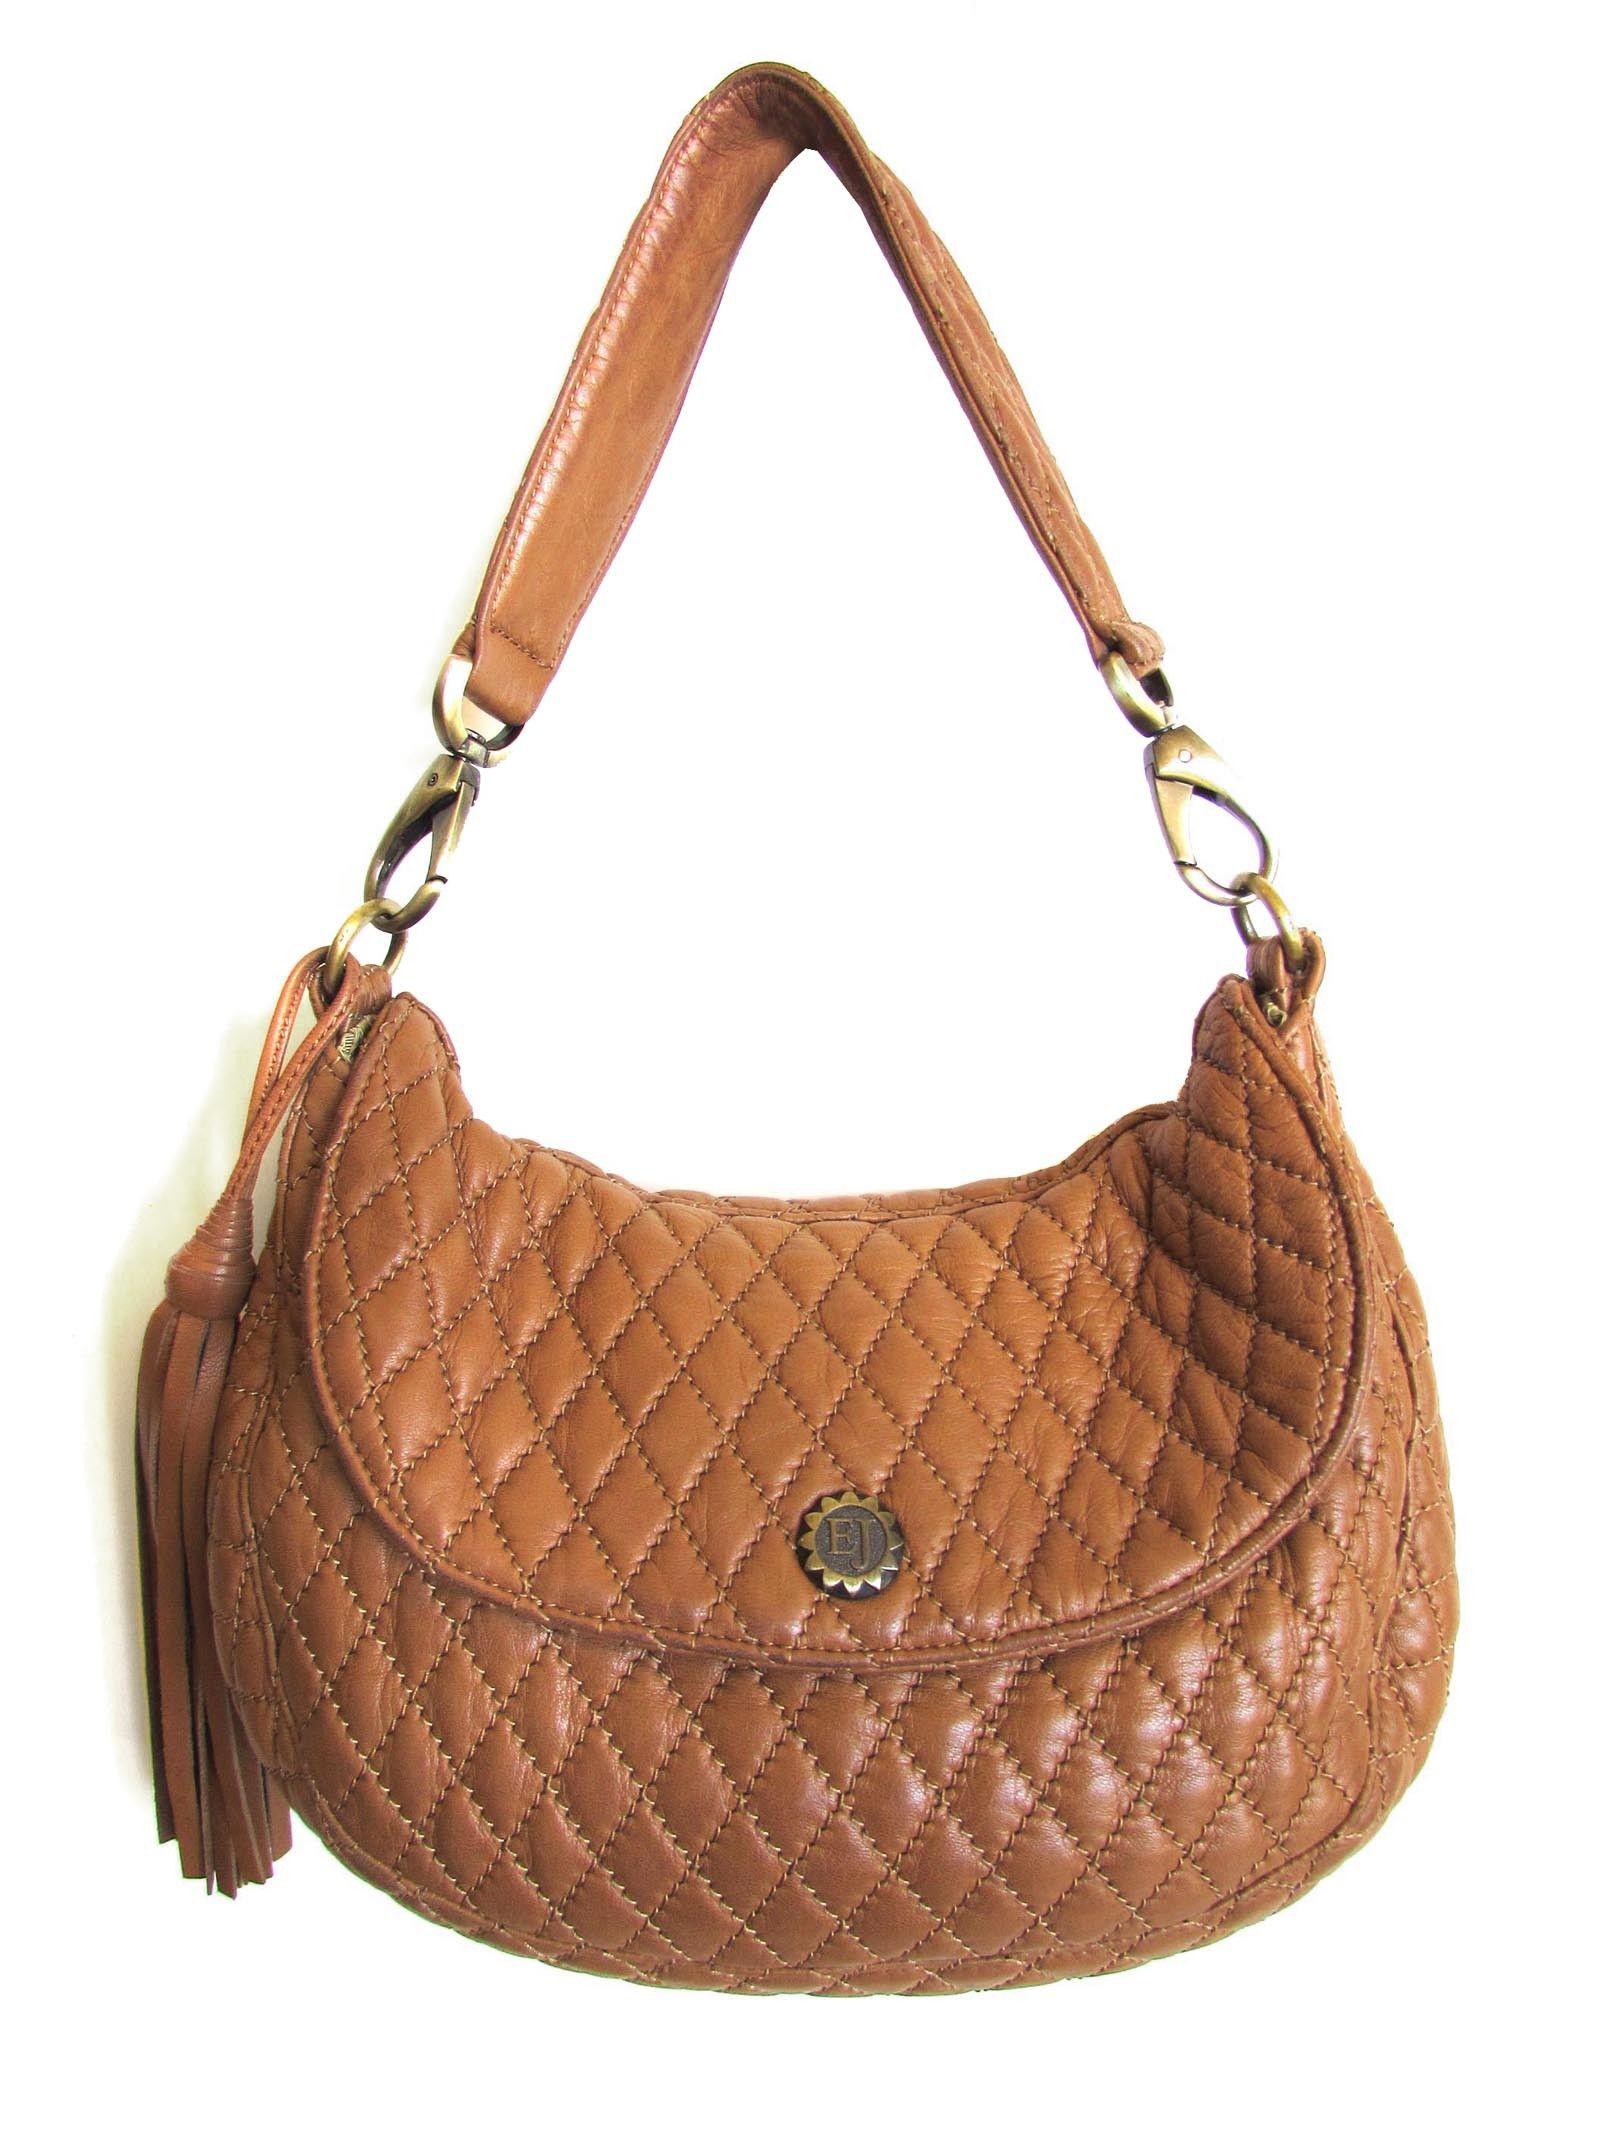 Eric Javits Light Brown Quilted Leather Hobo Handbag